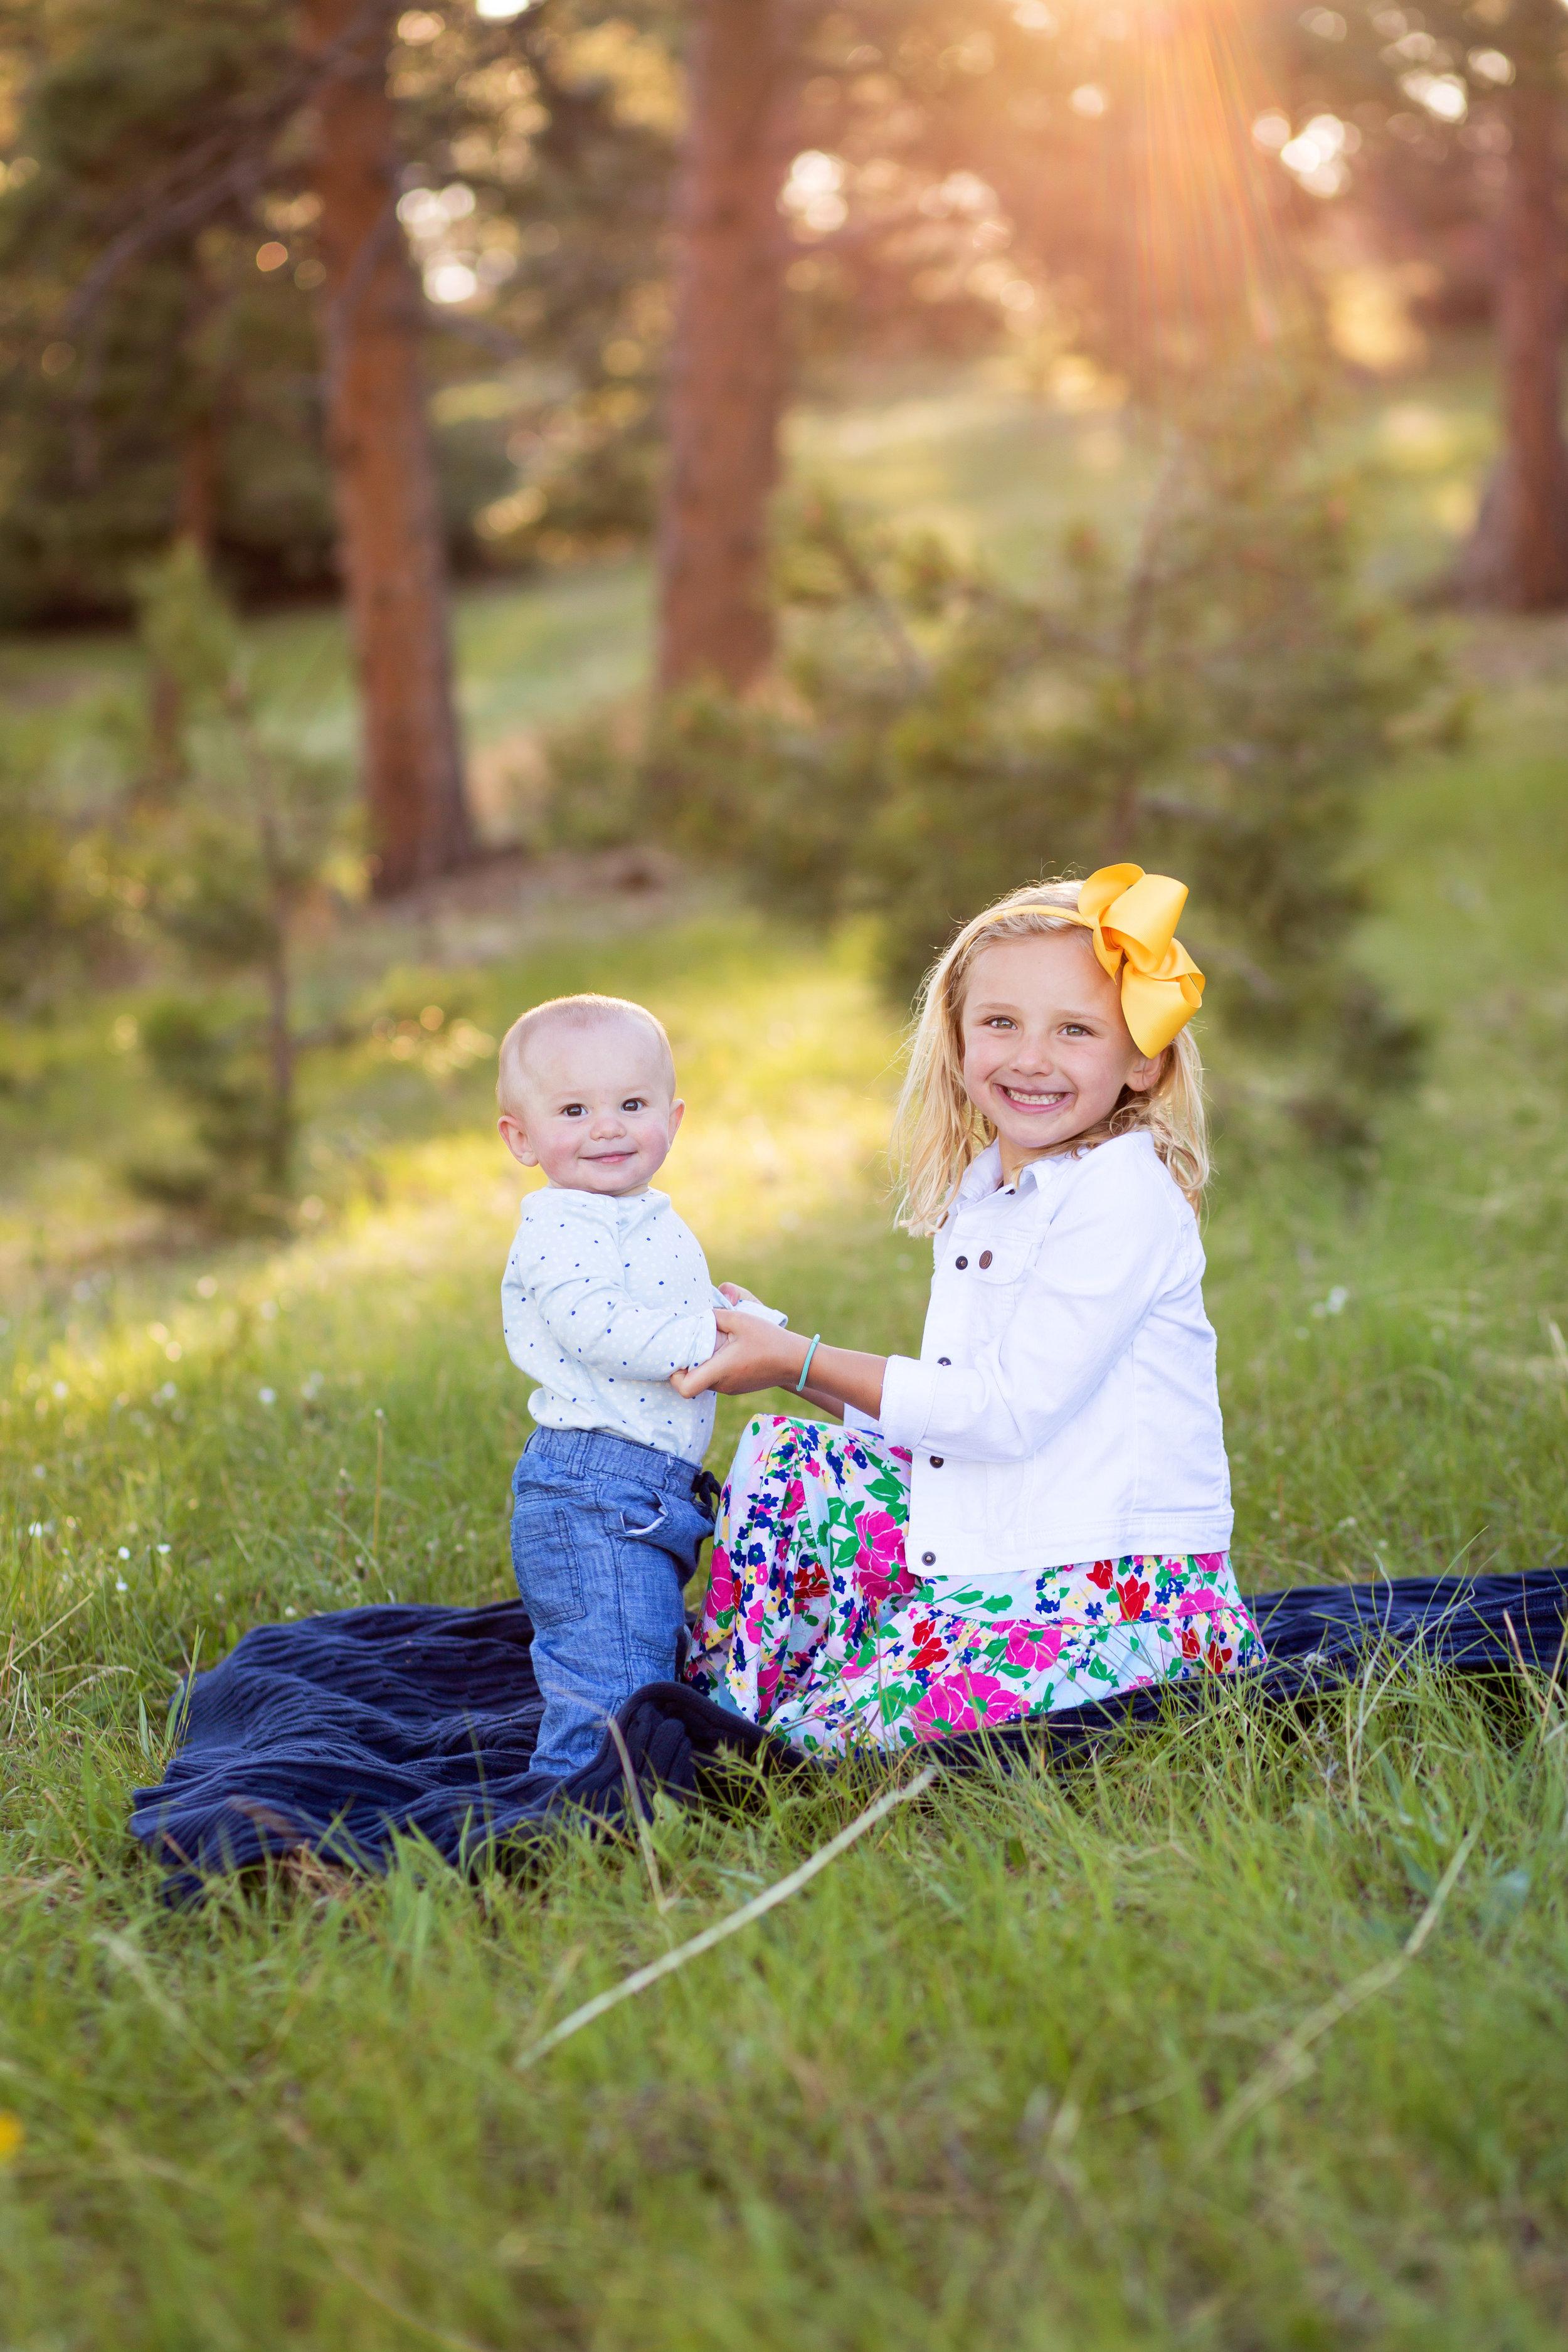 Denver Newborn Photographer Denver Baby's First Year Photographer Denver Baby Photographer-1318.jpg